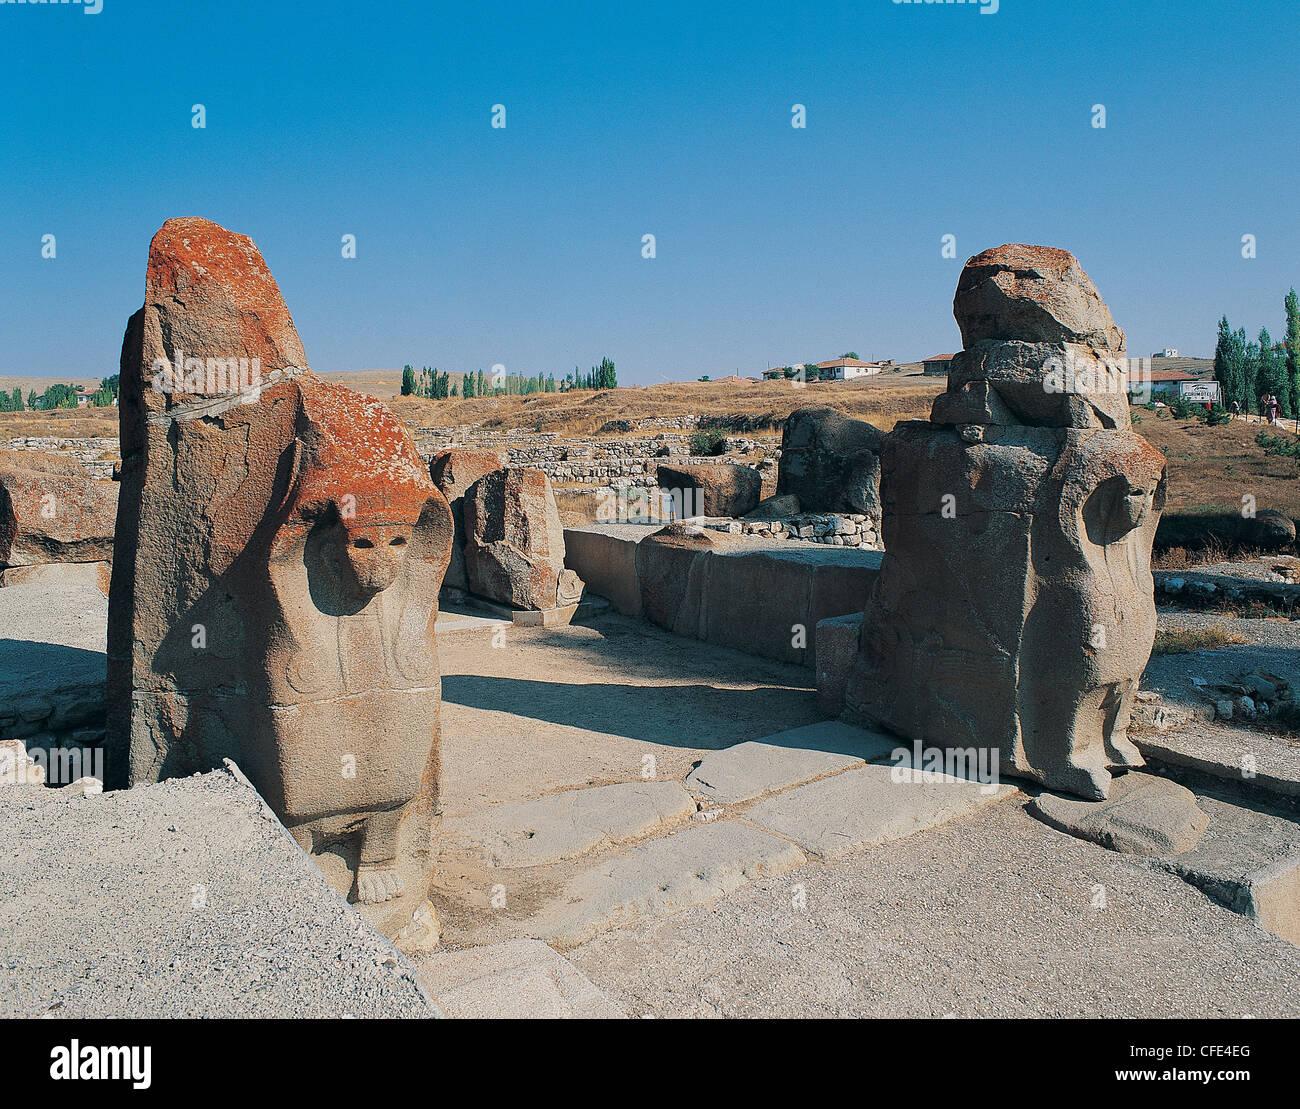 Sphinx Gate of ancient city Hattusas of Hittites Turkey - Stock Image